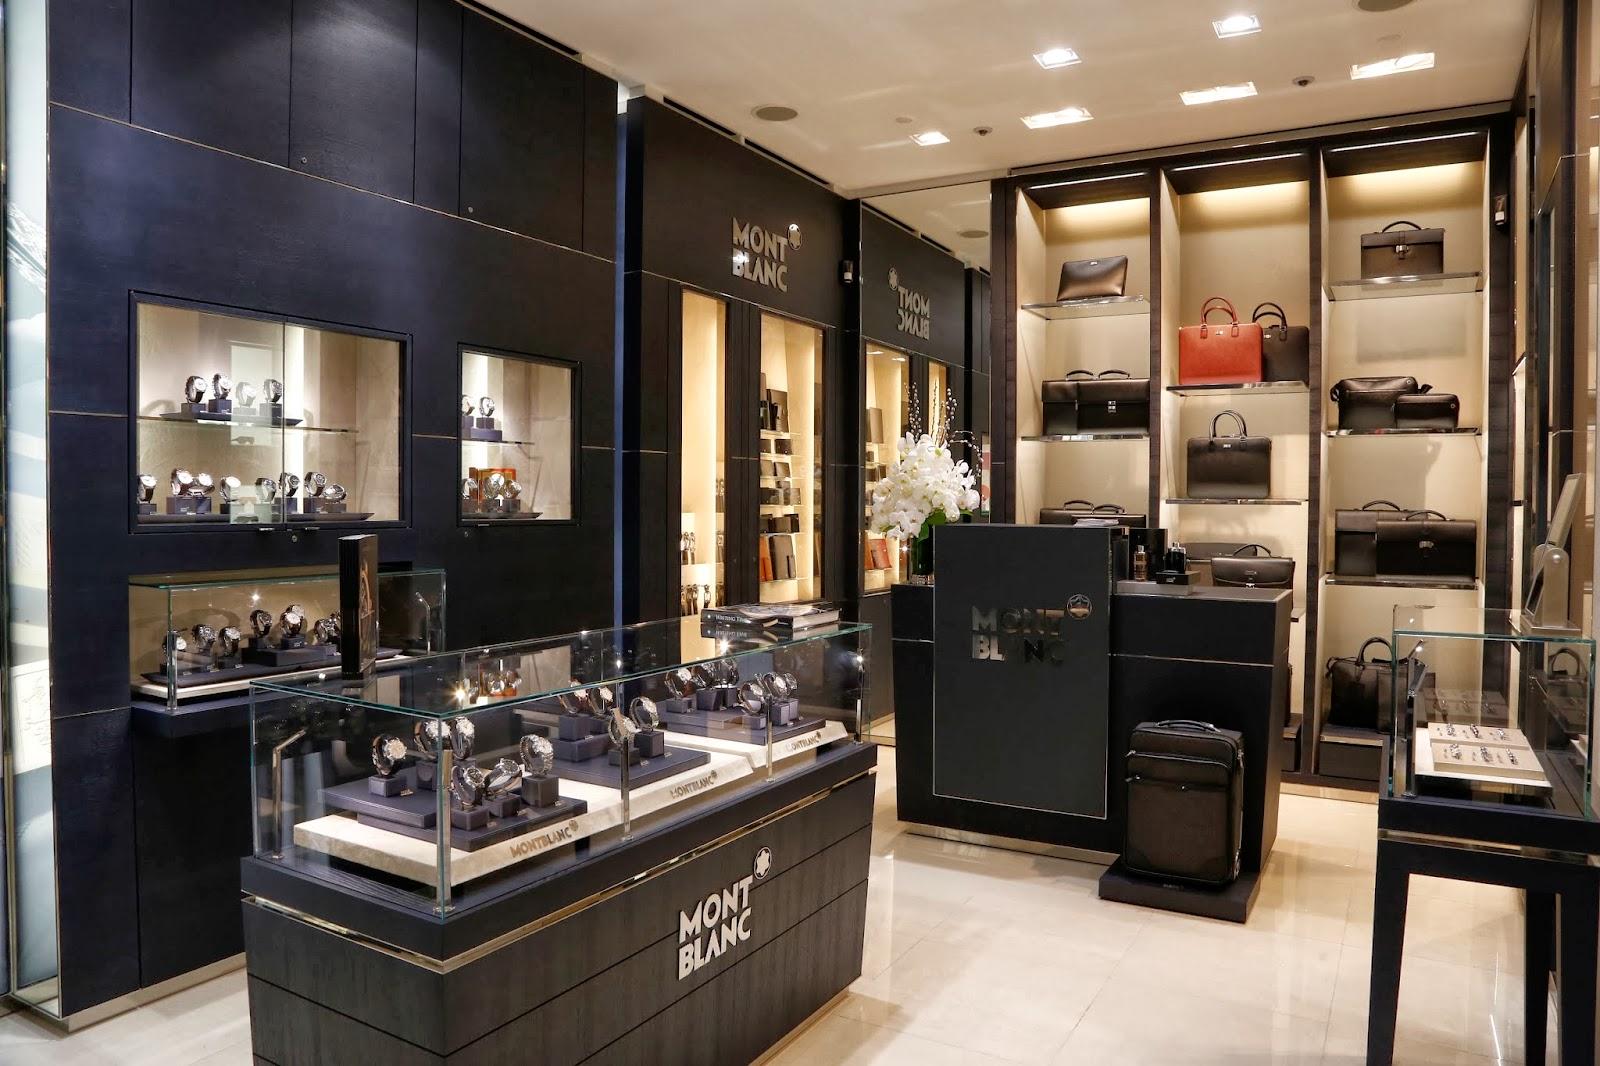 ber fashion marketing montblanc inaugura novo endere o exclusivo em s o paulo a boutique. Black Bedroom Furniture Sets. Home Design Ideas